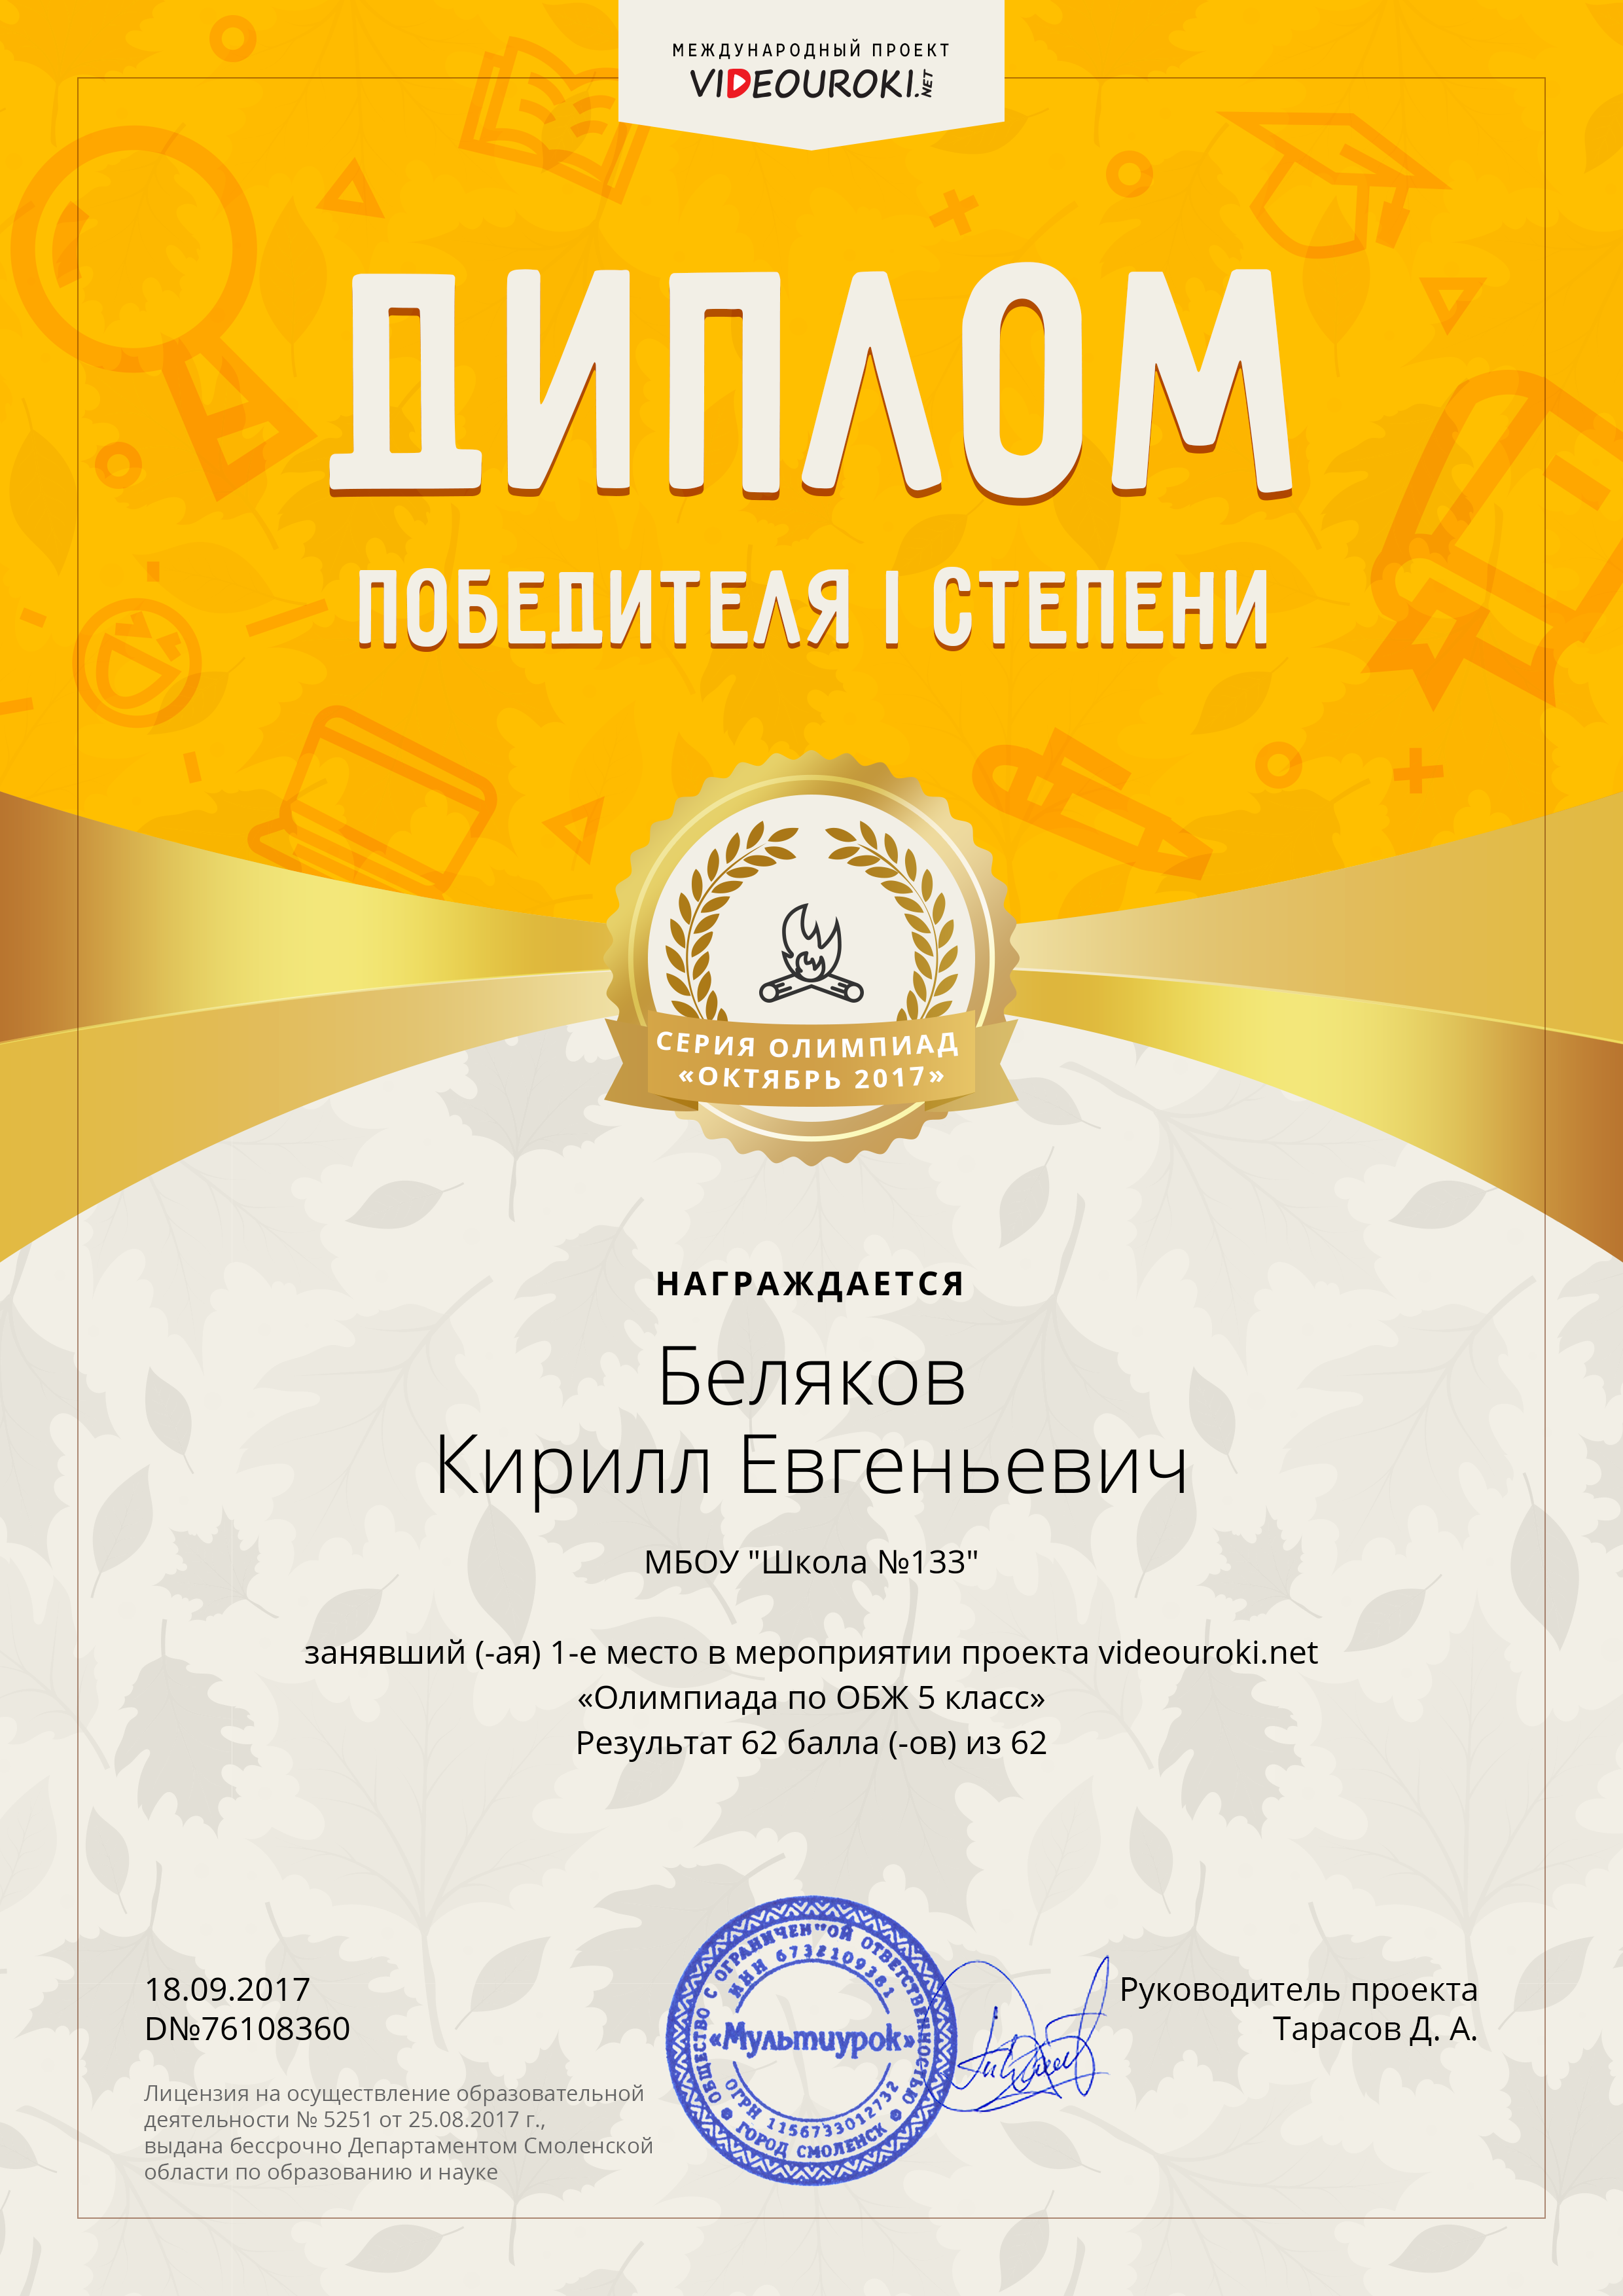 91493321. 76108360-Беляков Кирилл Евгеньевич.png